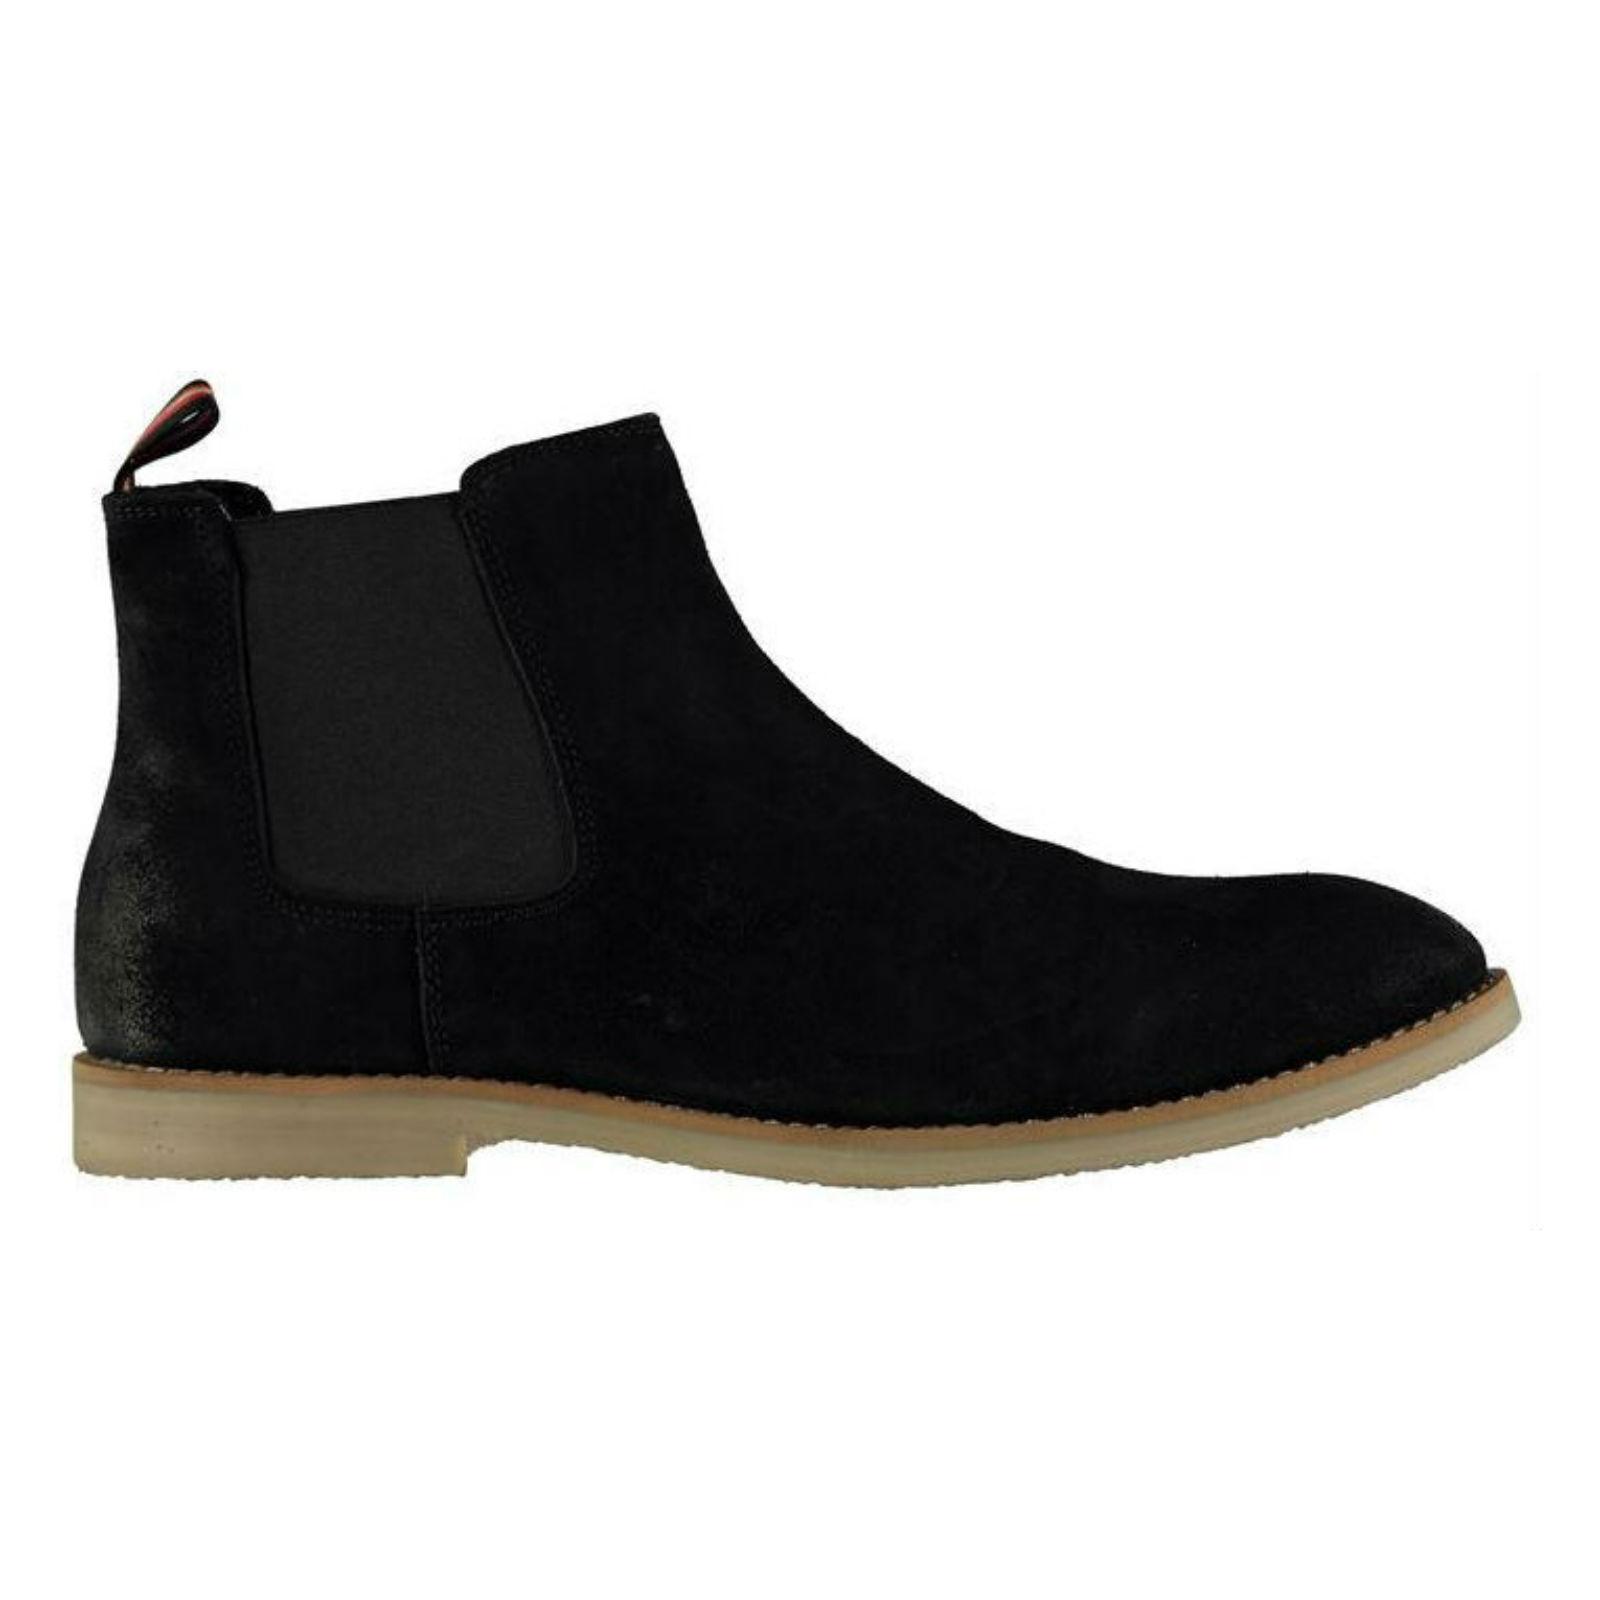 CASUAL Herren LUKE  SUEDE LEATHER DESERT ANKLE Stiefel CASUAL  CHELSEA WALKING CHUKKA Schuhe a7bacc